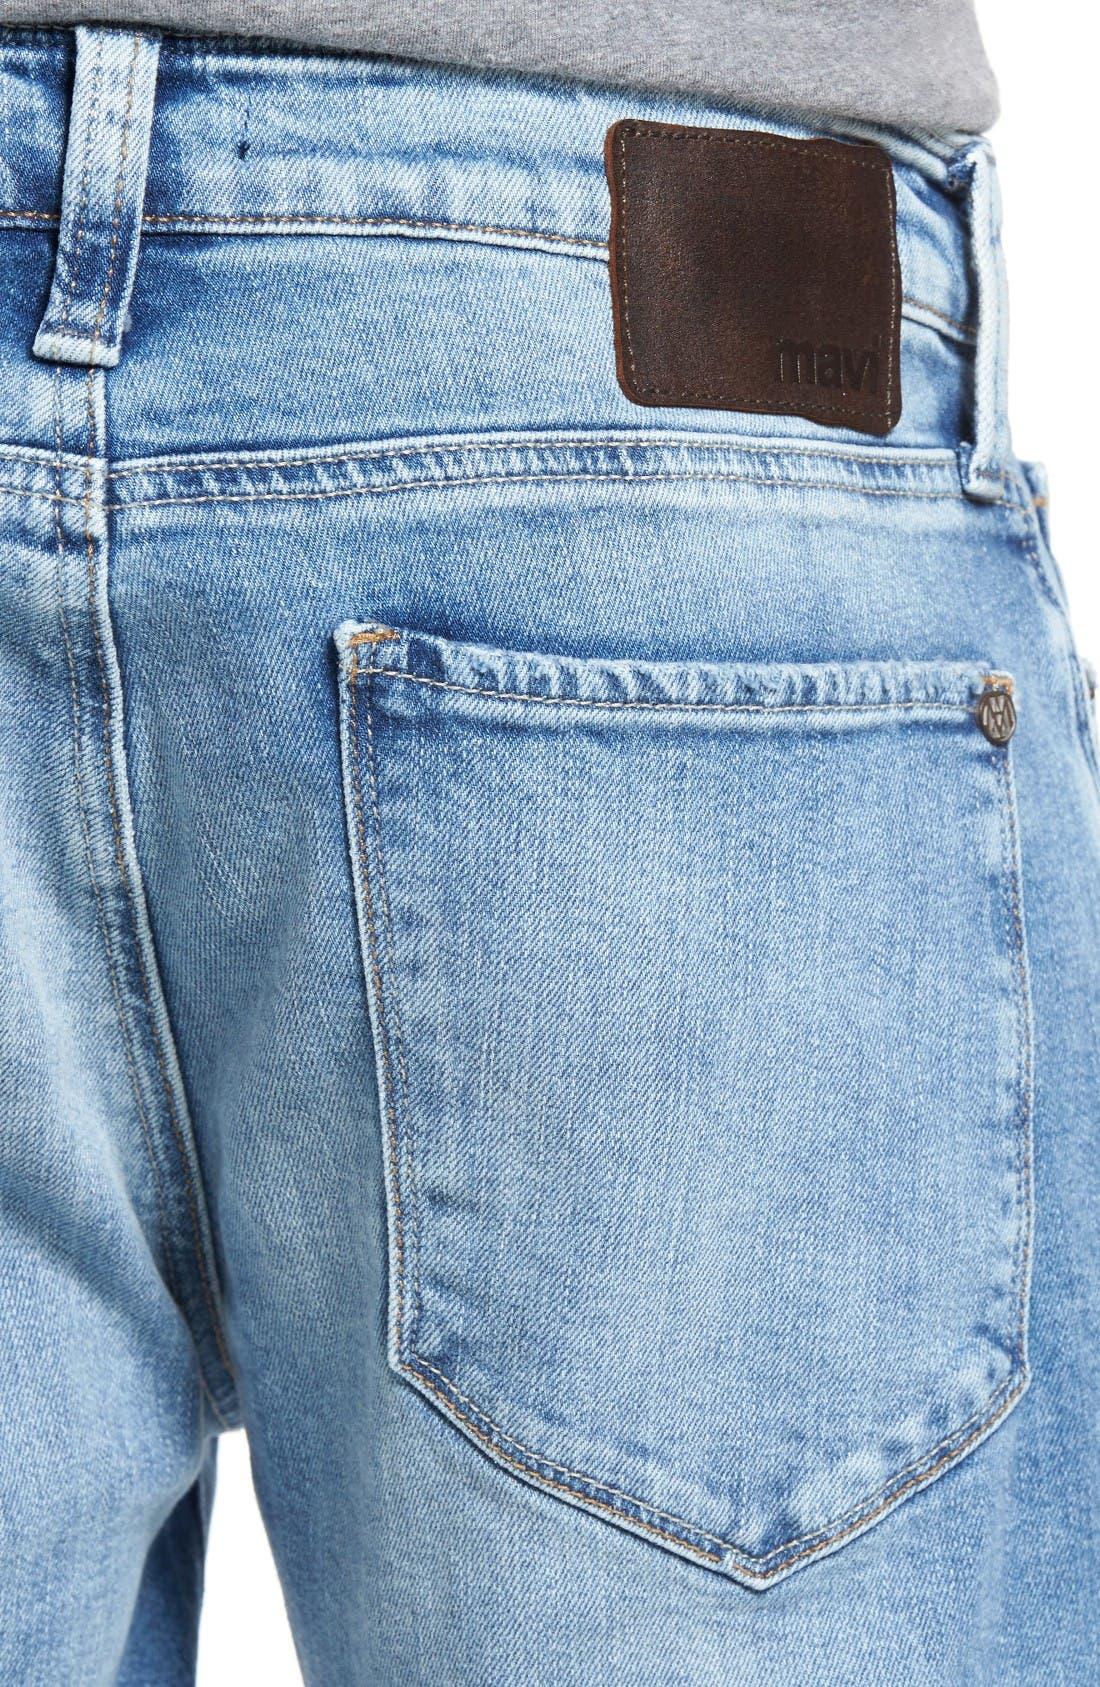 Alternate Image 4  - Mavi Jeans Jake Easy Slim Fit Jeans (Ripped)